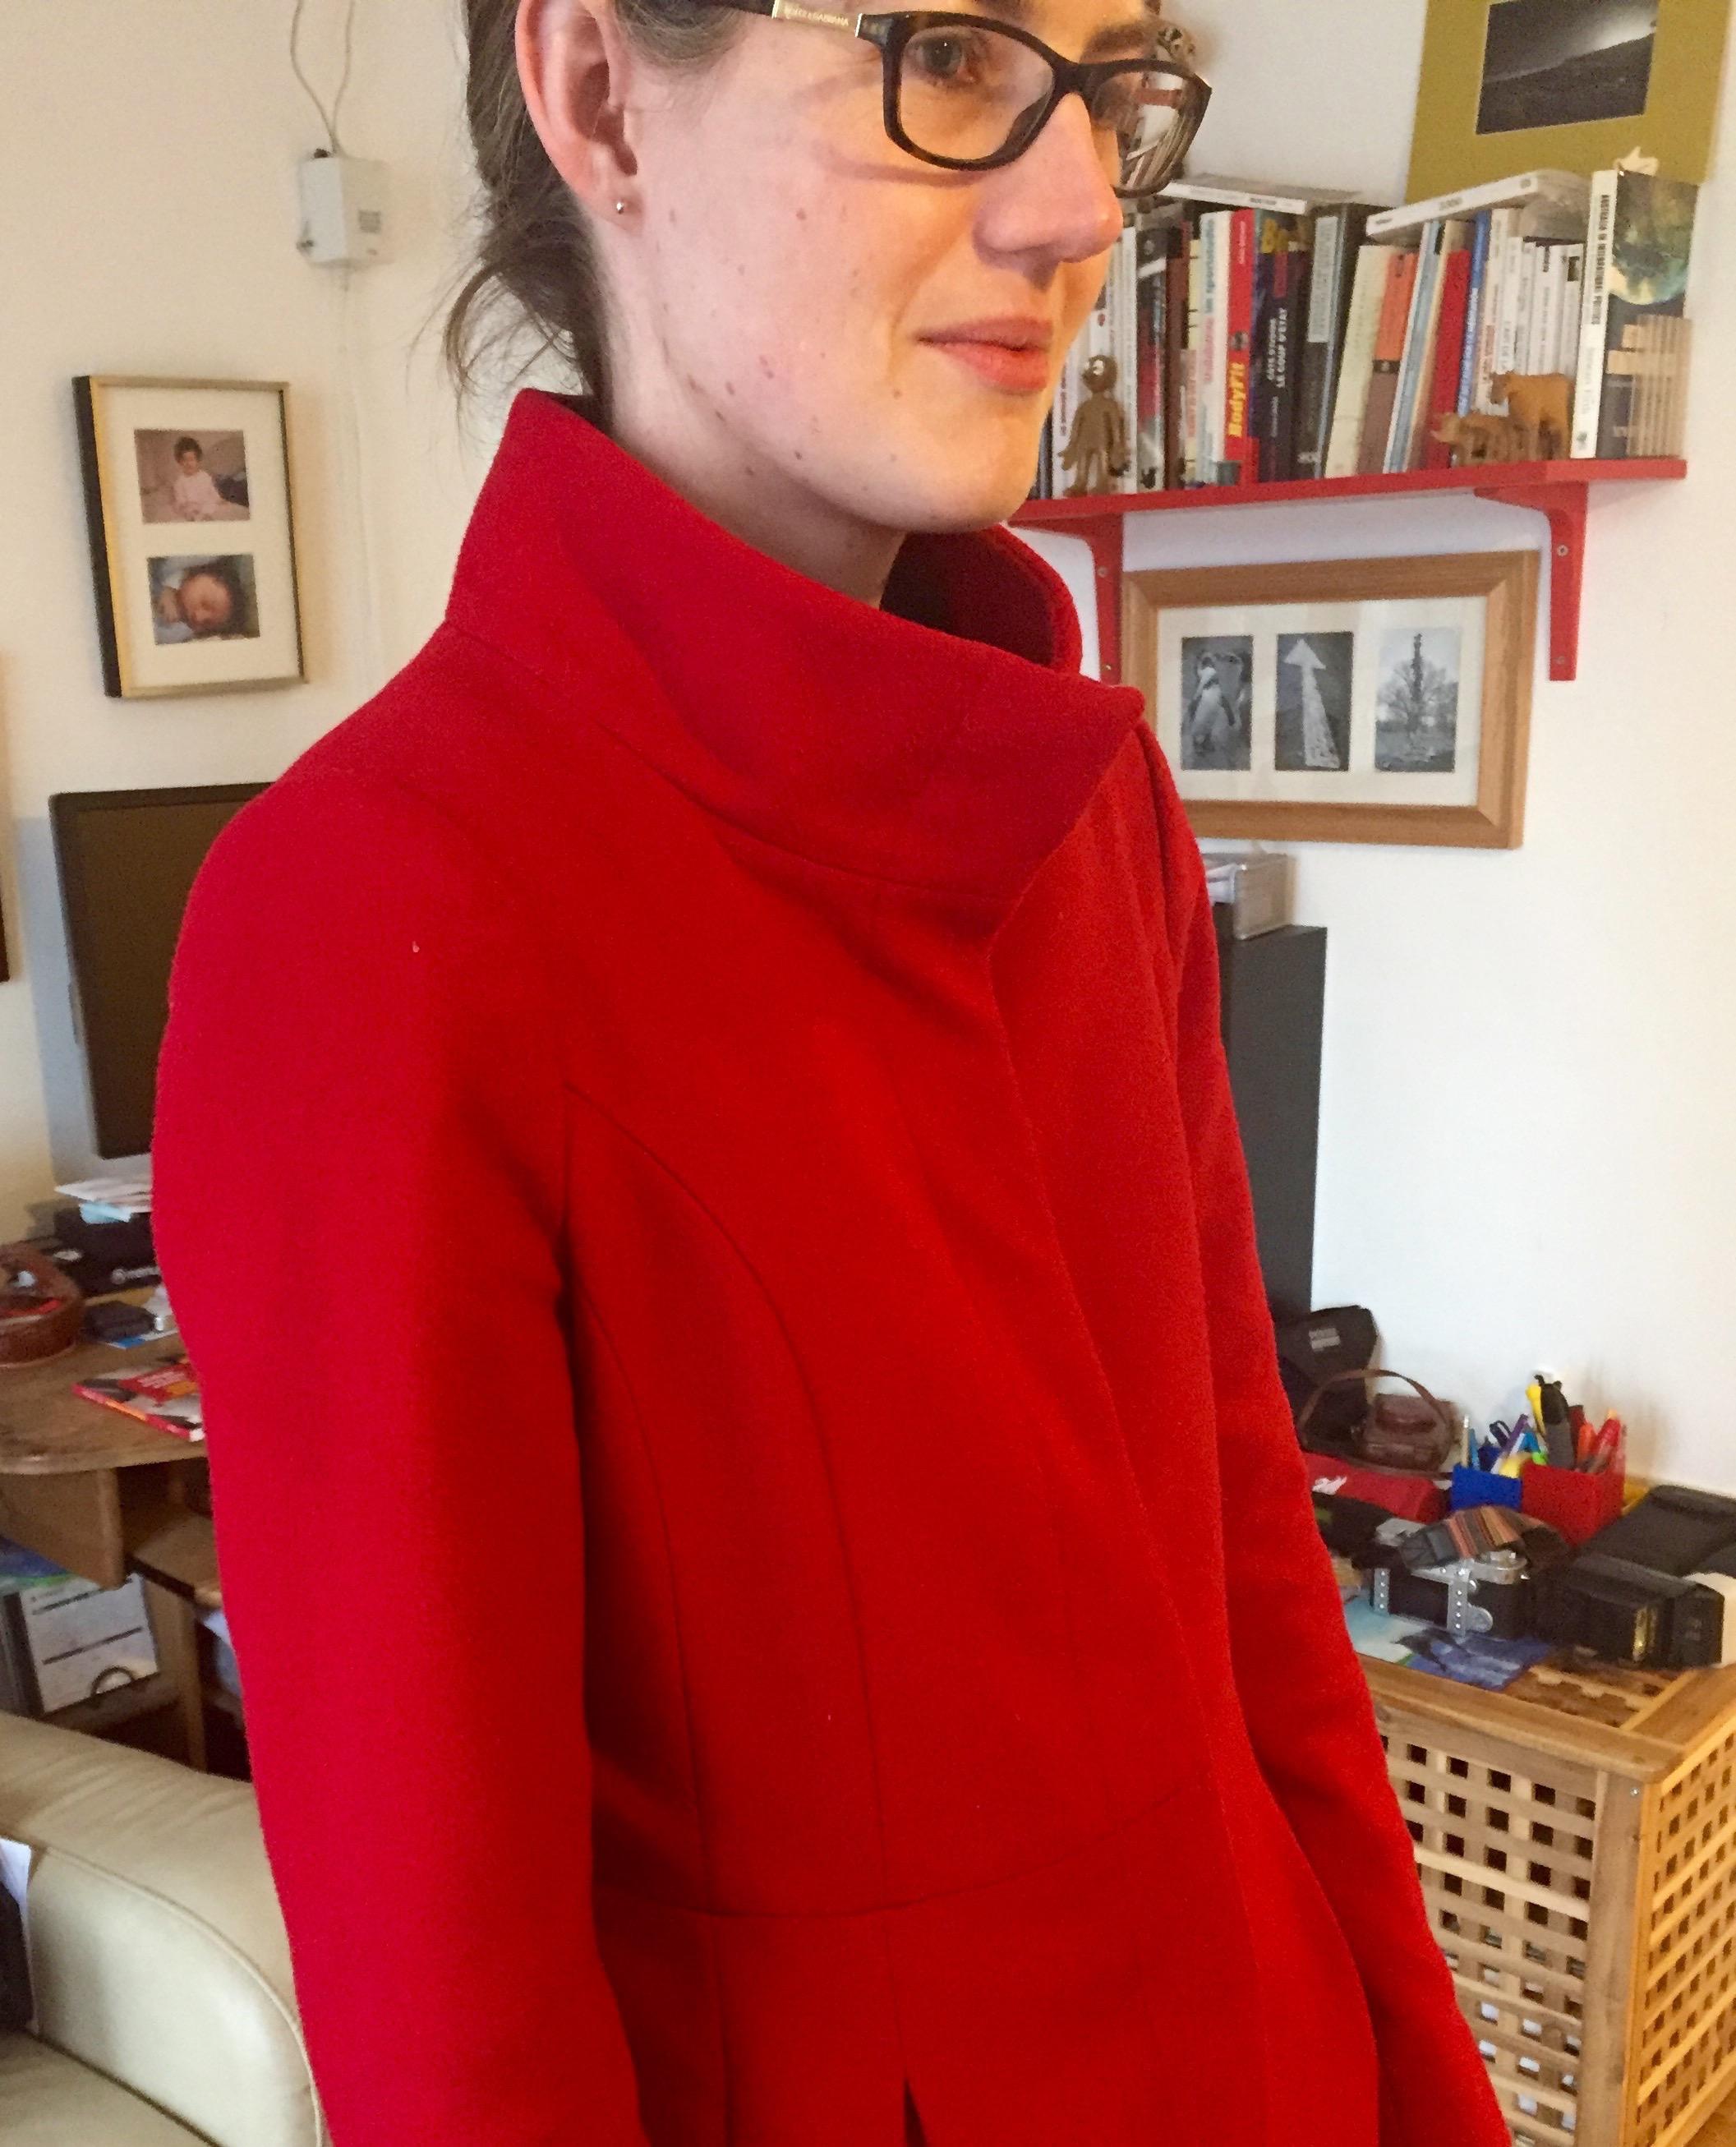 High collar to keep neck warm?Check.